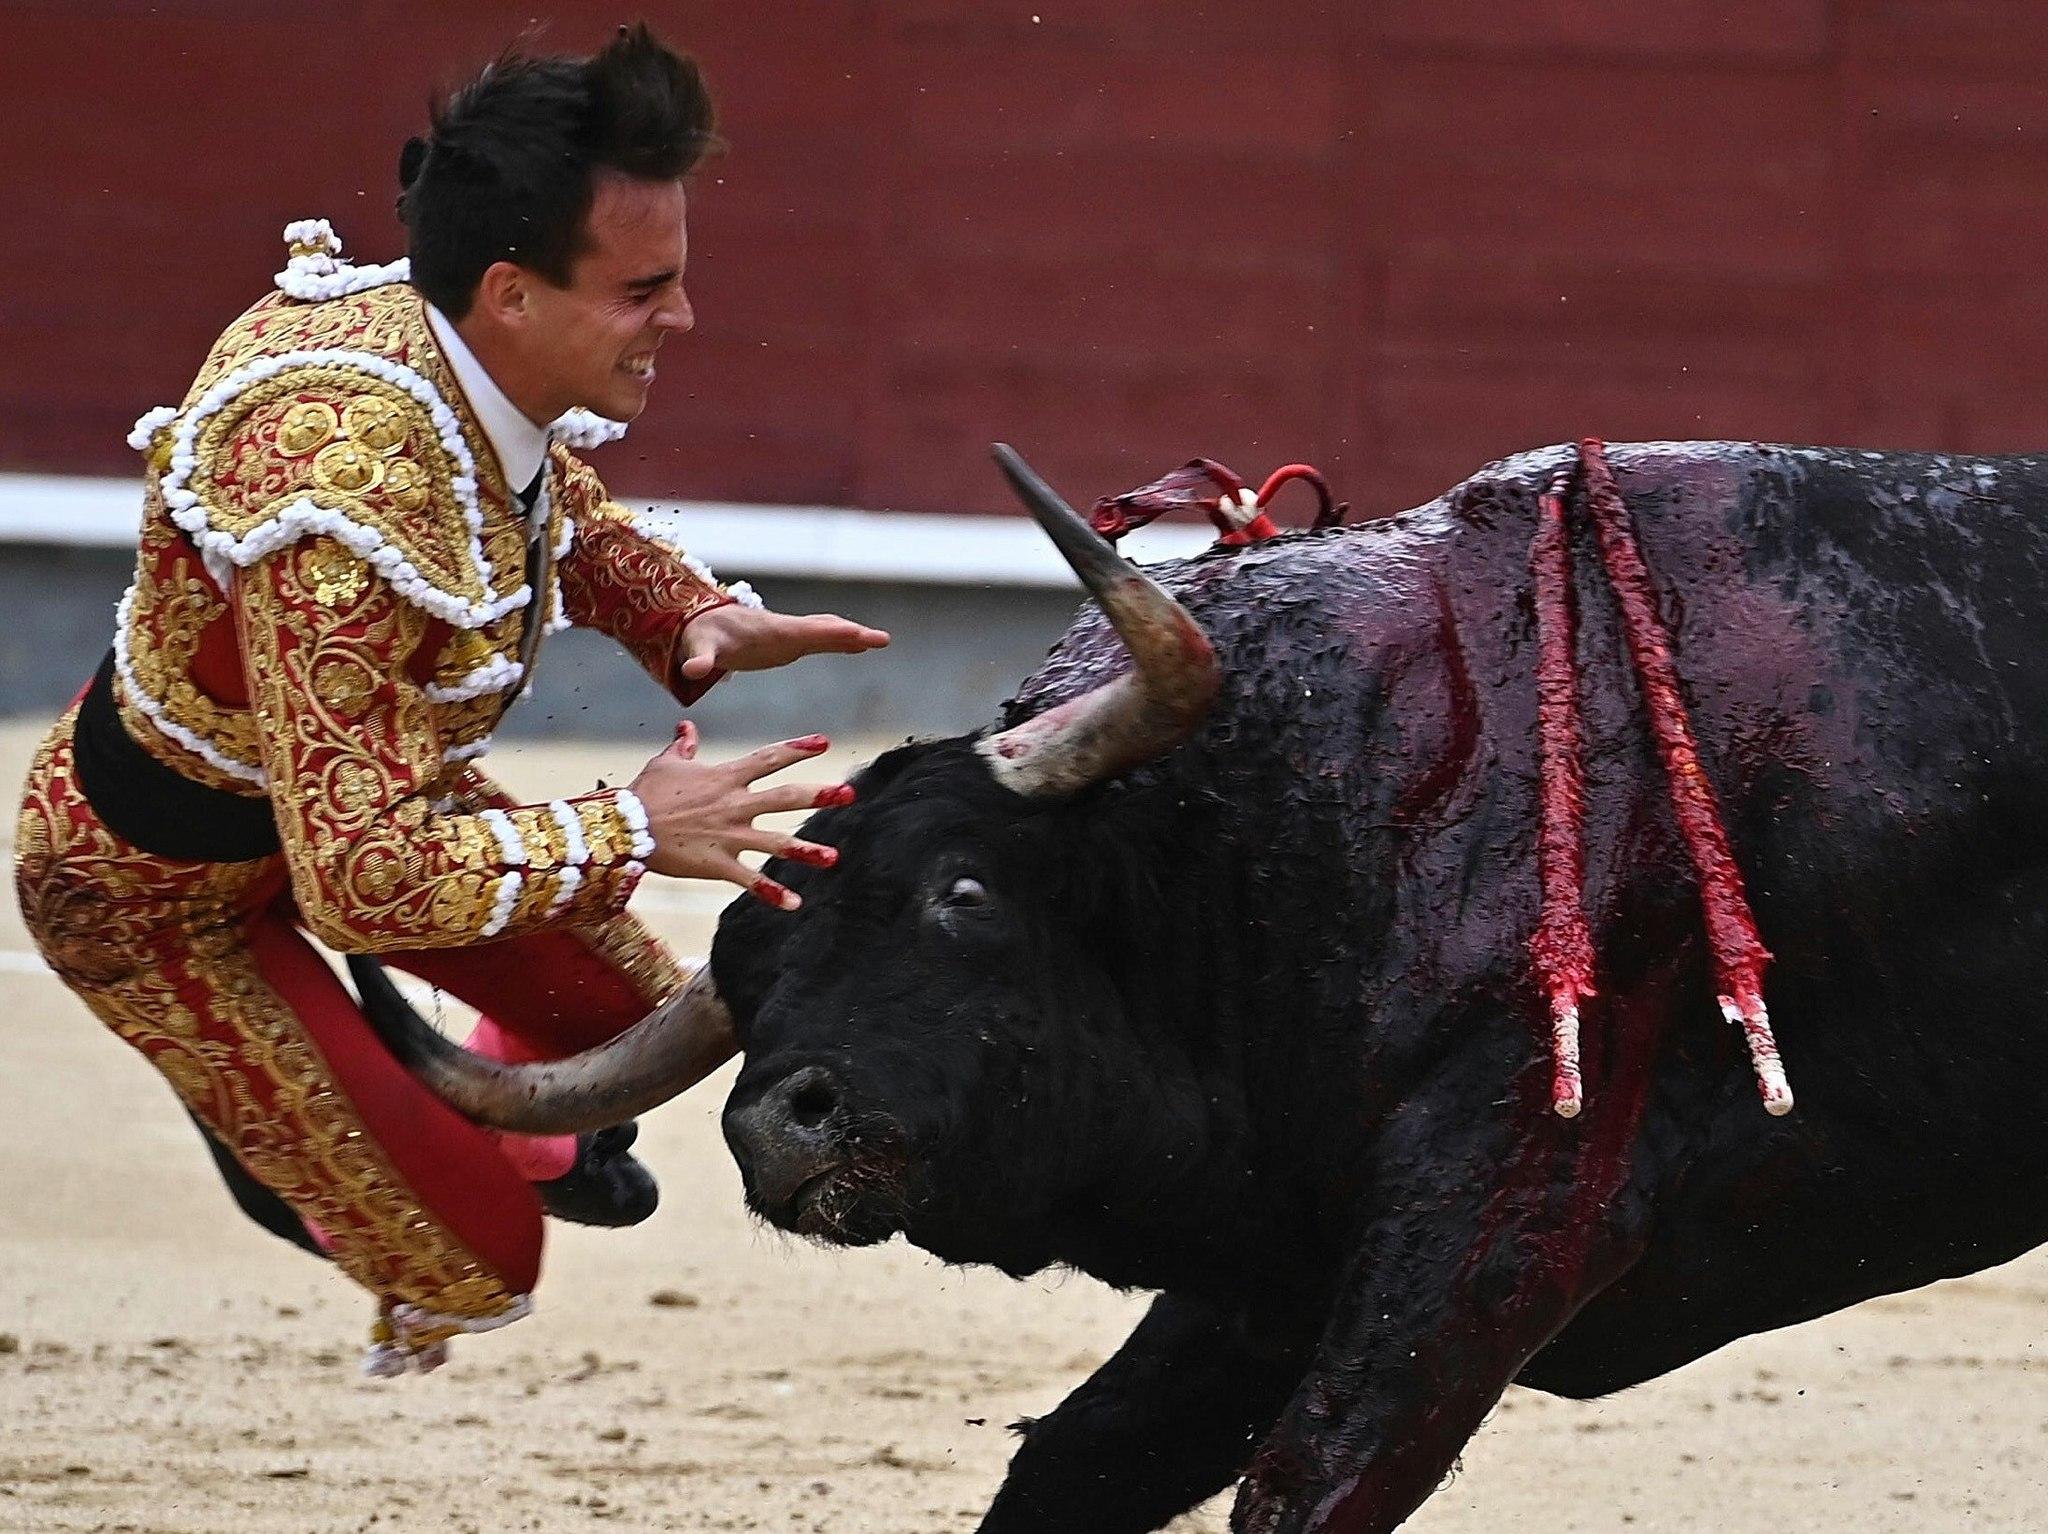 -FOTODELDIA- GRAF9327. MADRID.- El diestro Gonzalo...